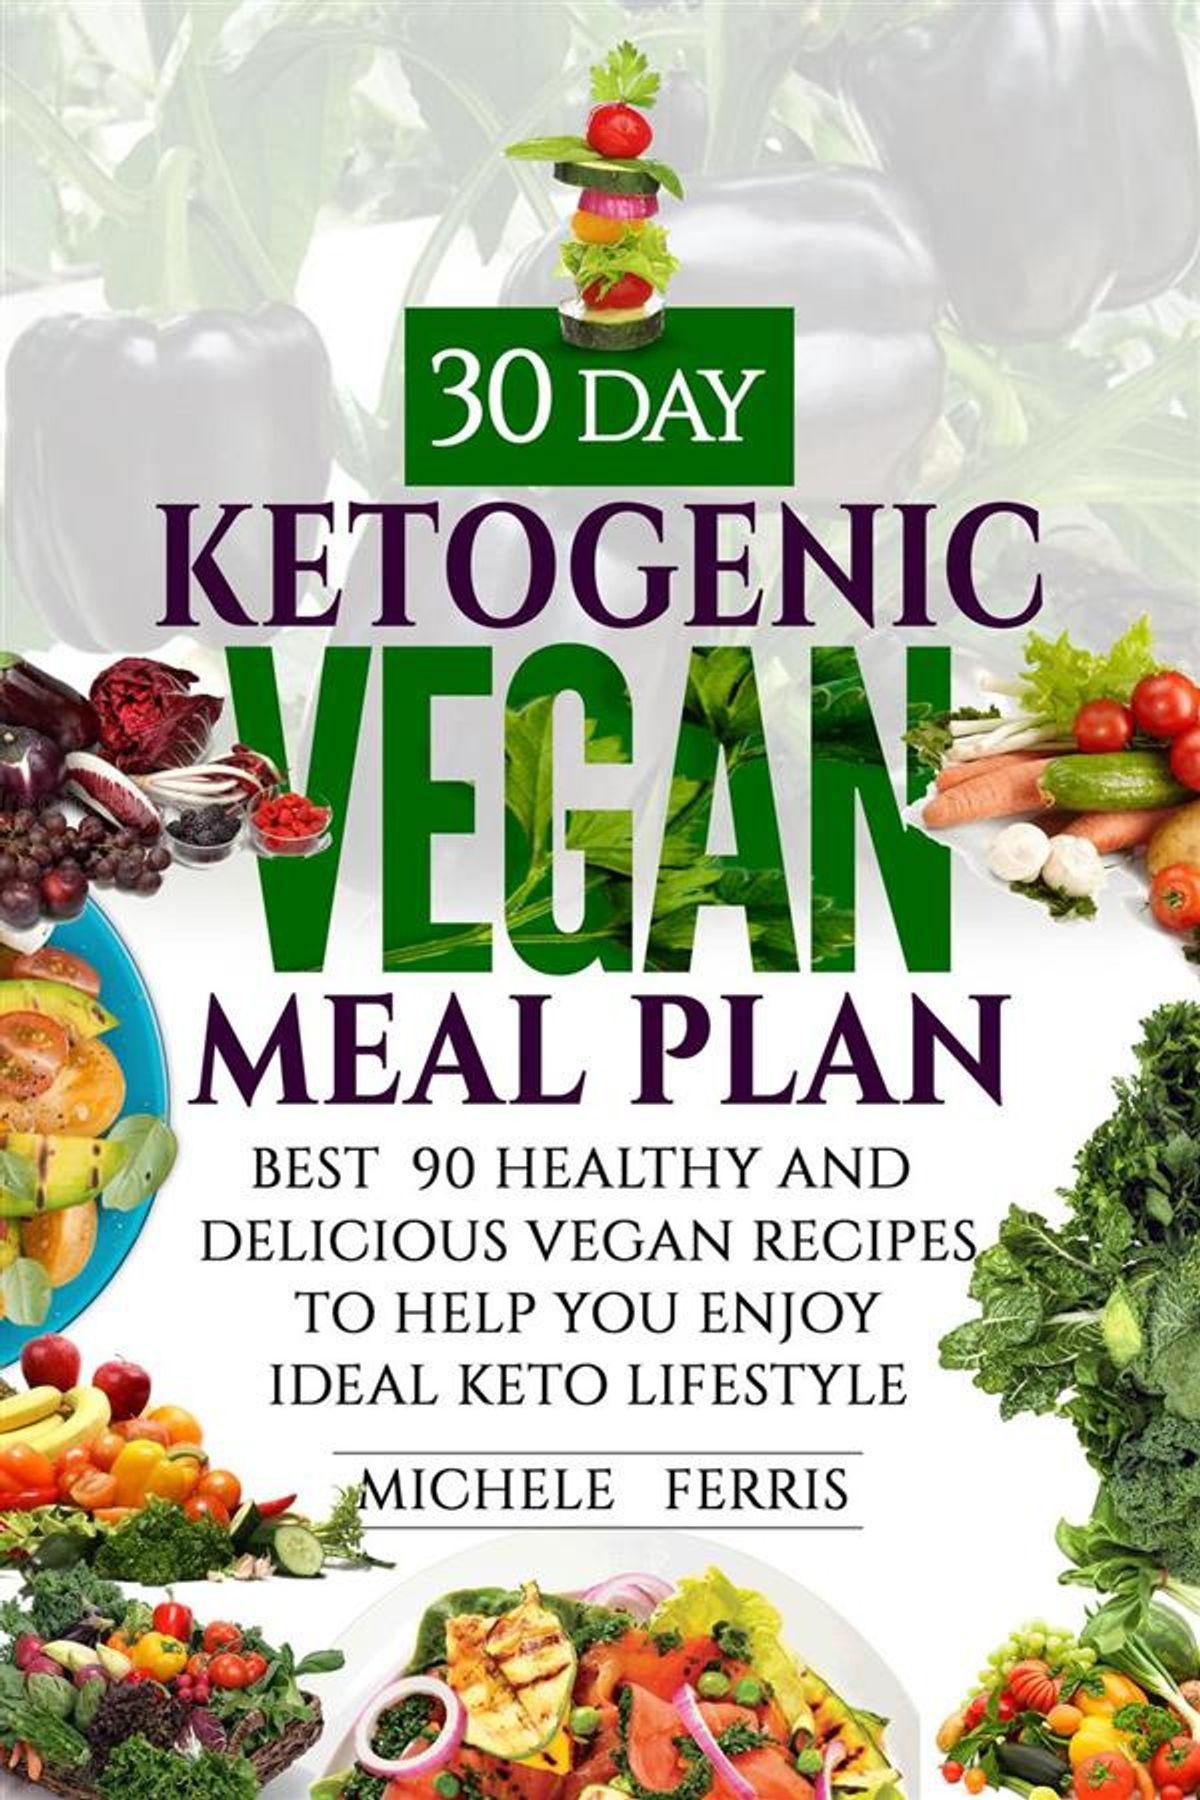 Keto Vegan Diet Plan  30 Day Ketogenic Vegan Meal Plan Best 90 Healthy and